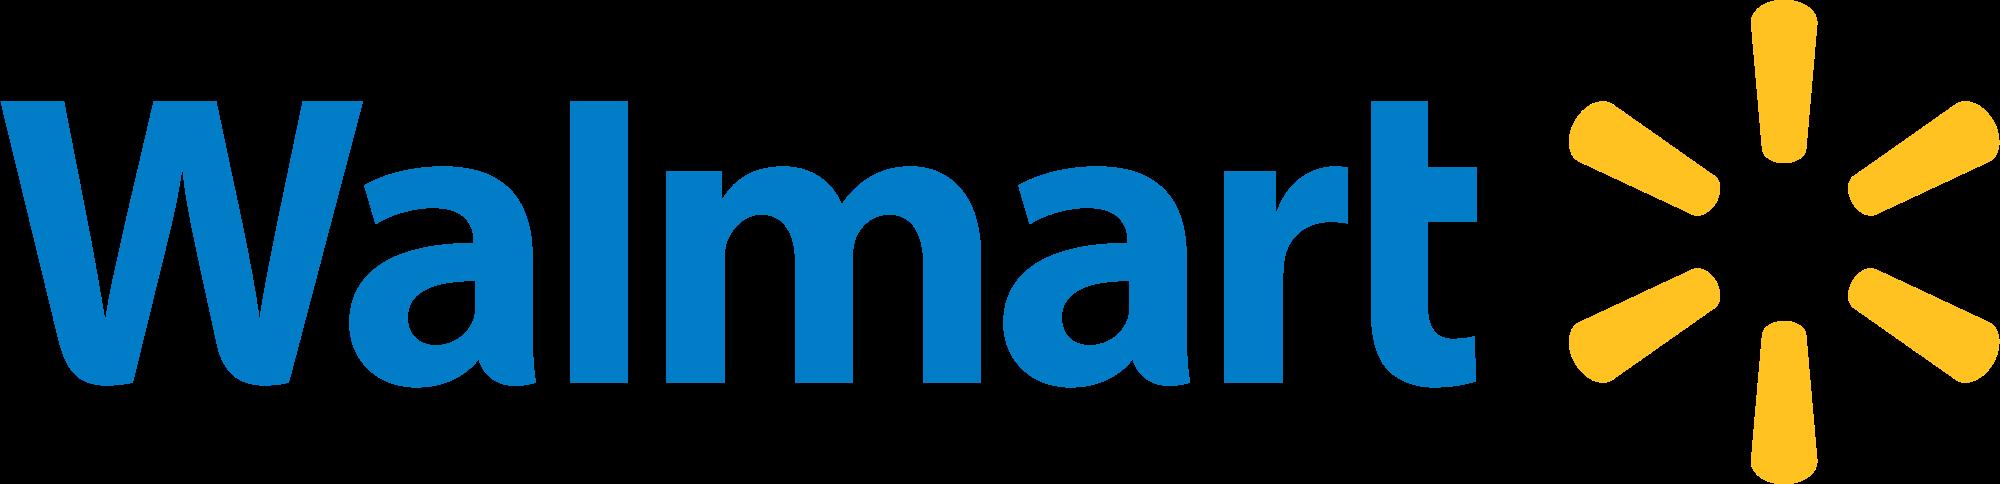 YMMV B&M - Walmart Shorts Sale - 1$